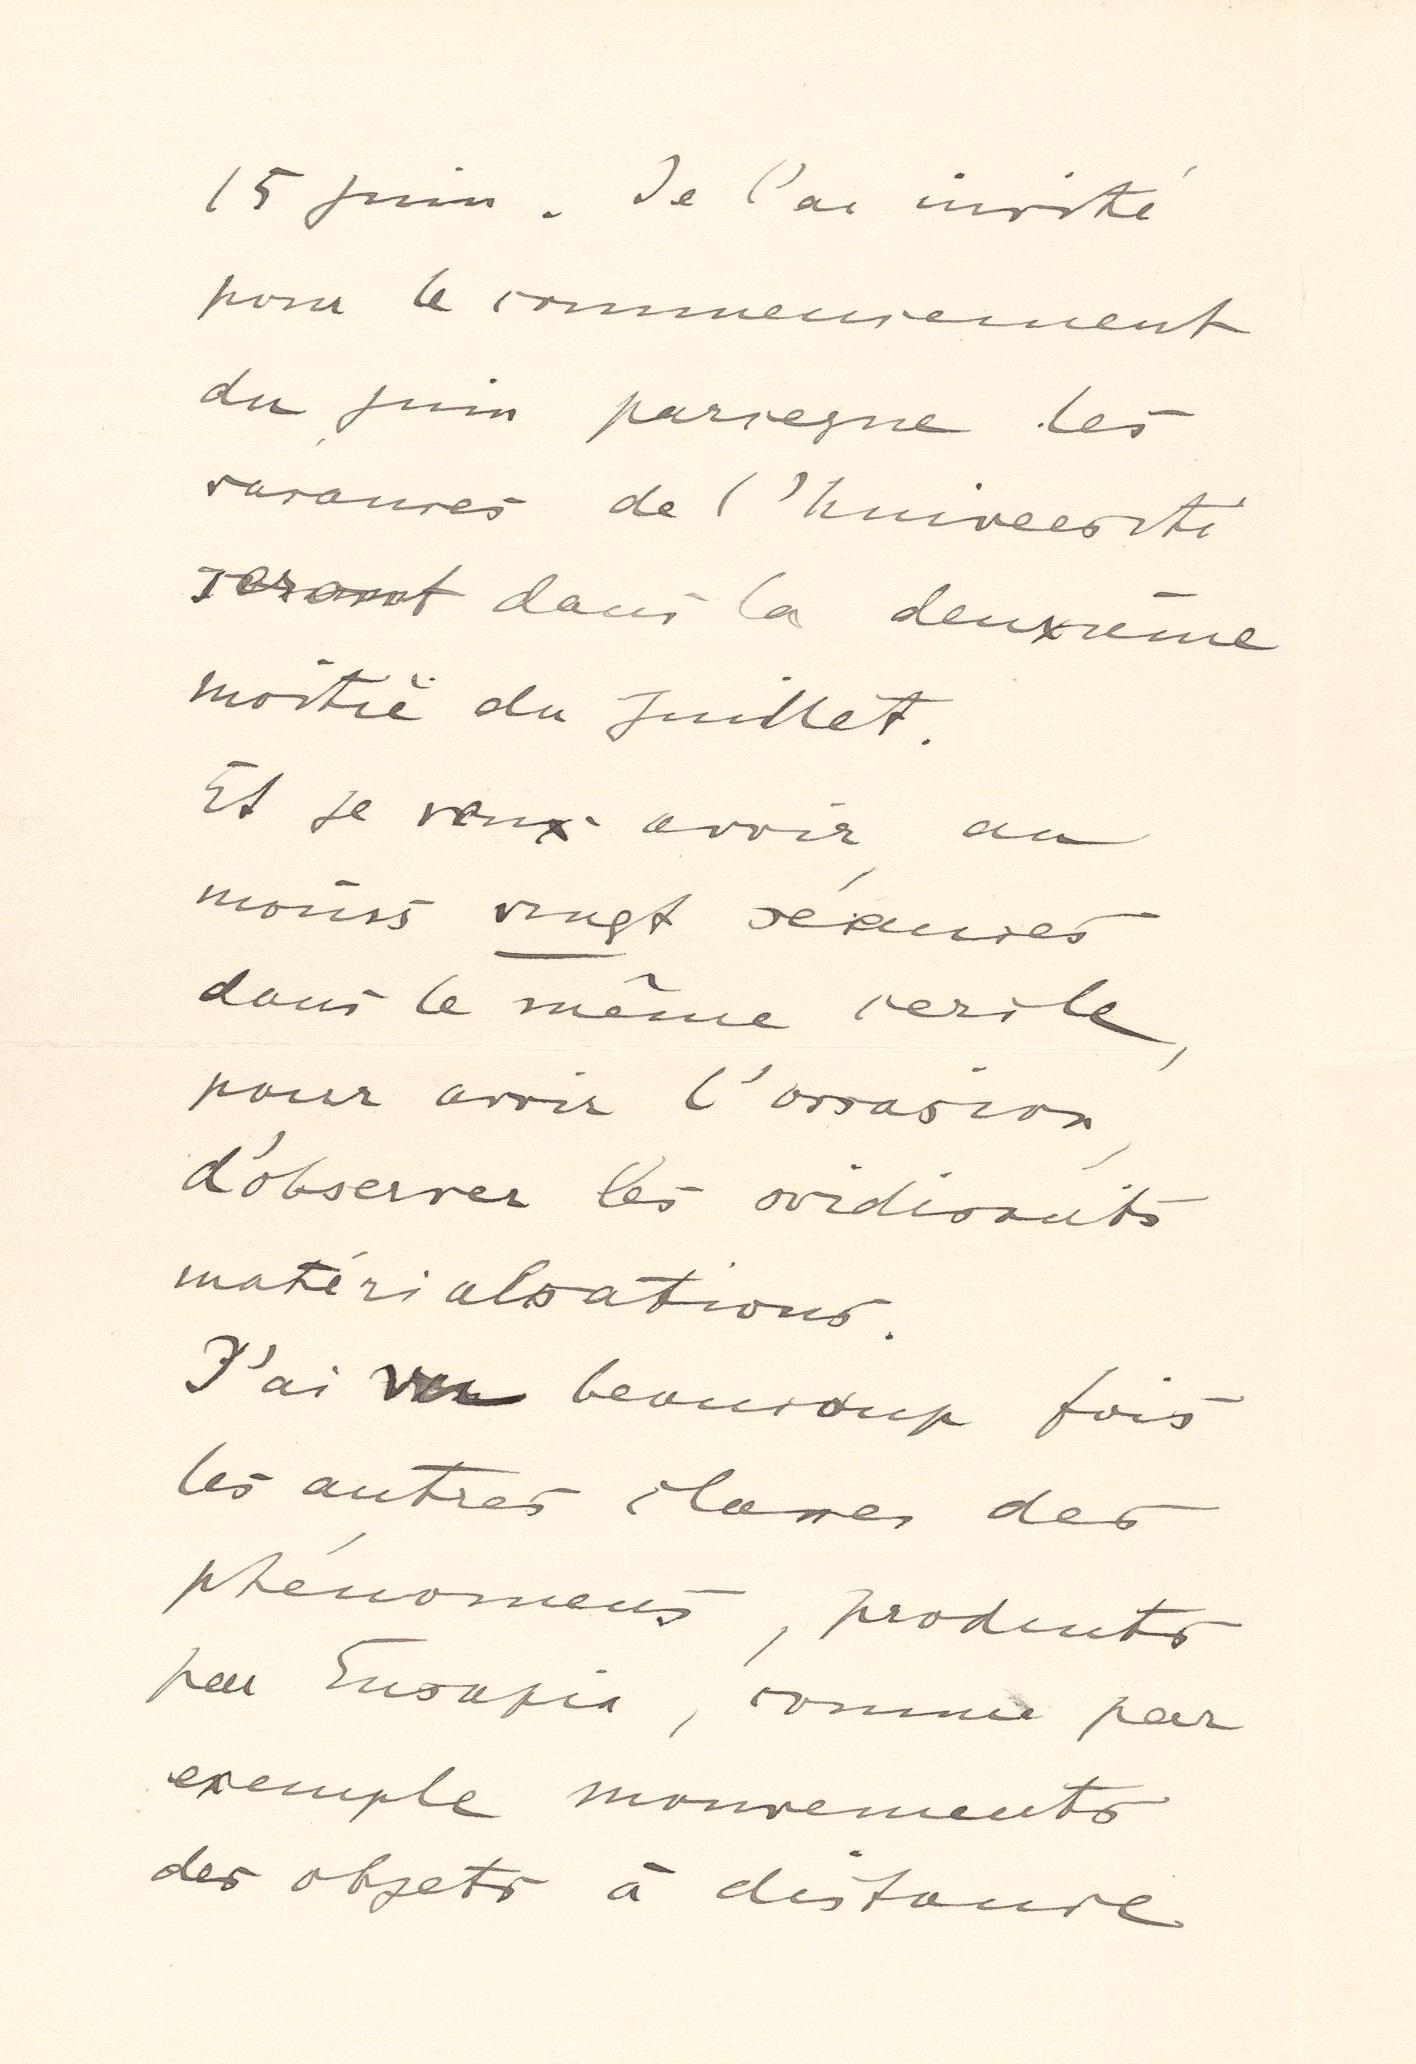 Albert Philibert Franz von Schrenck-Notzing